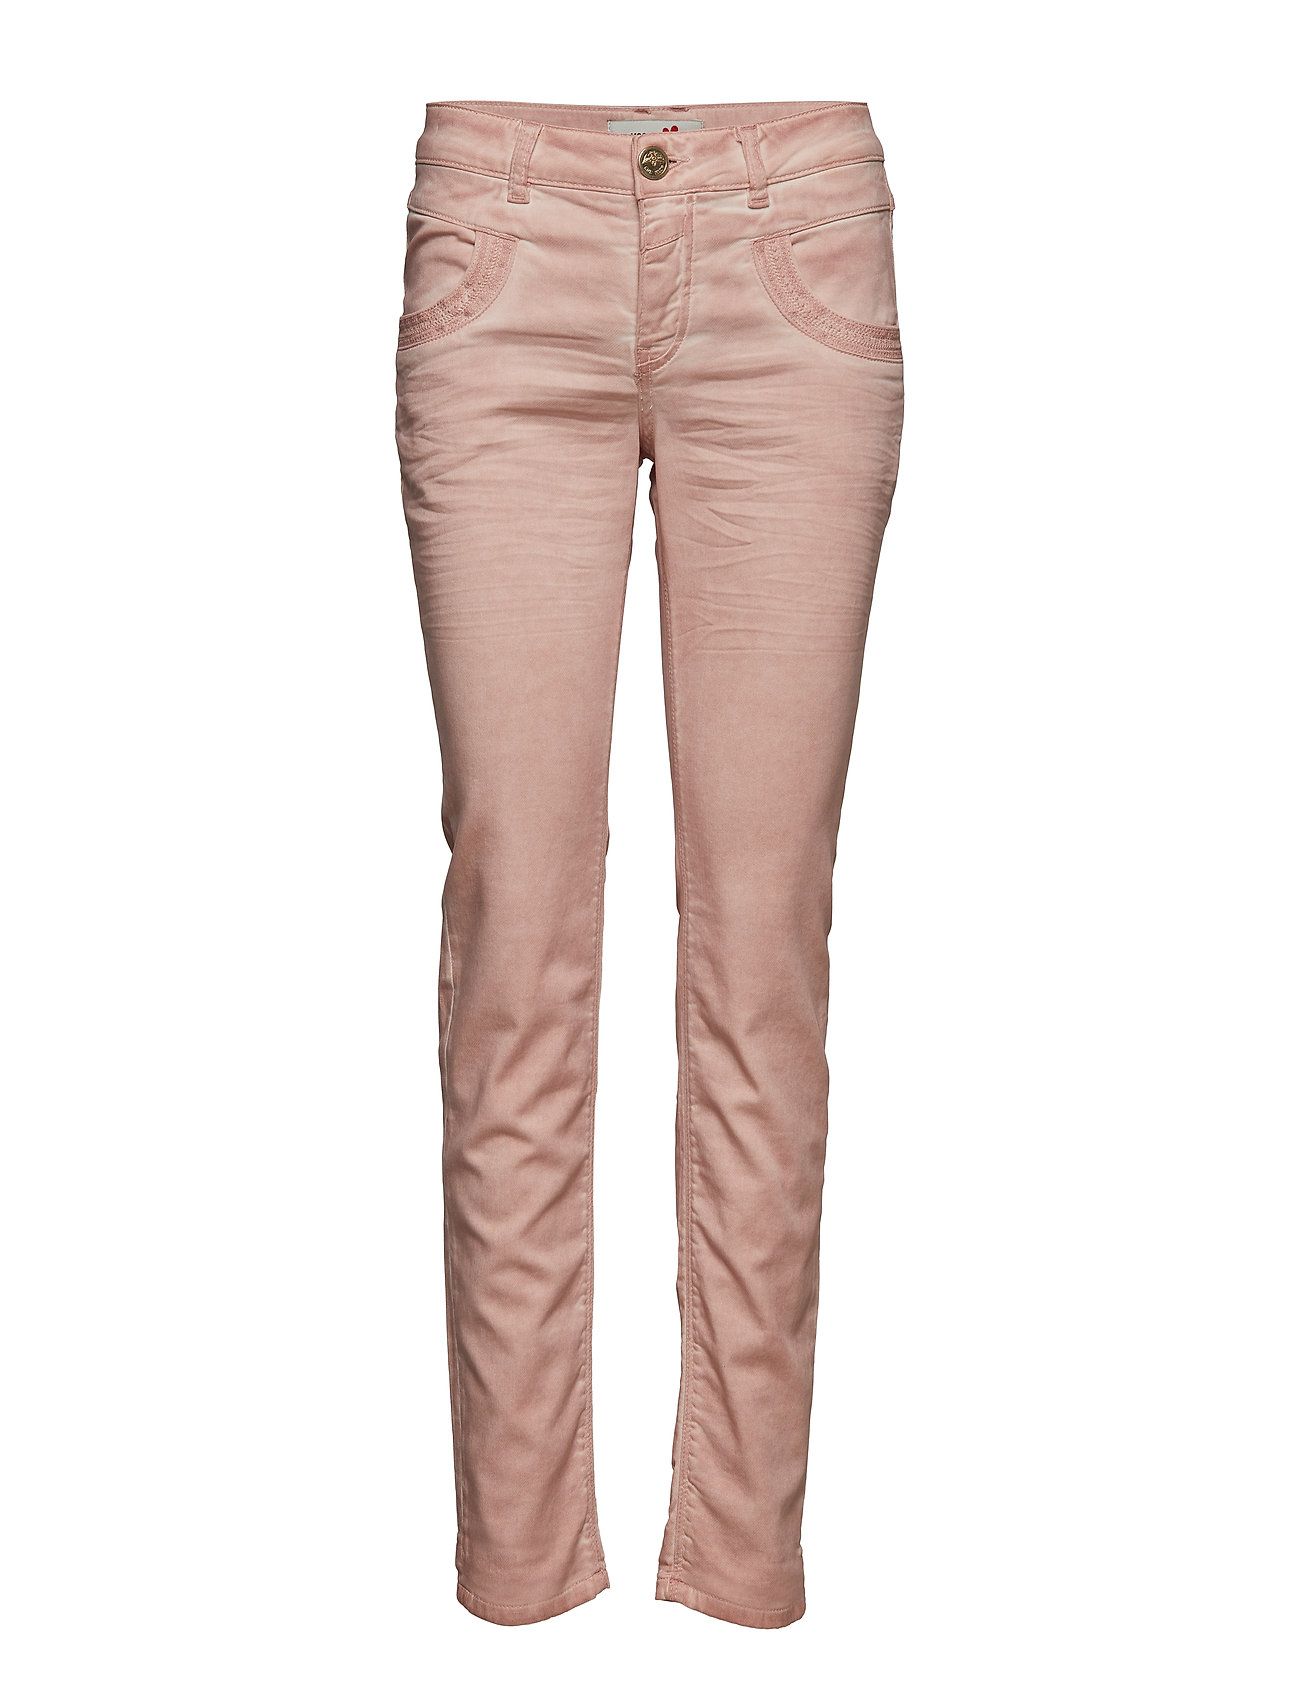 MOS MOSH Naomi Embroidery Soft Pant